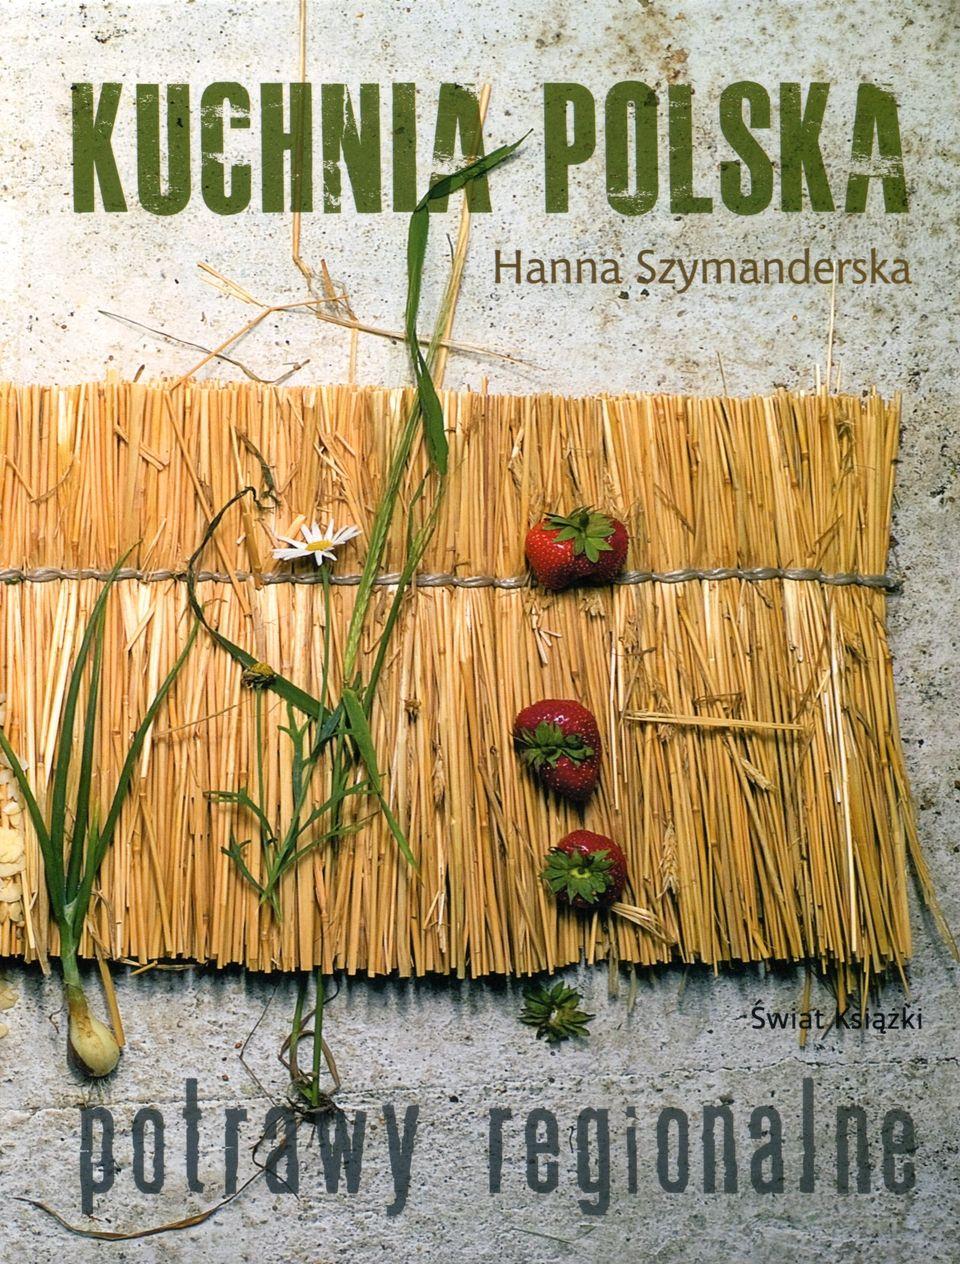 Kuchnia Polska Potrawy Regionalne Food Recipe Book Cookbook